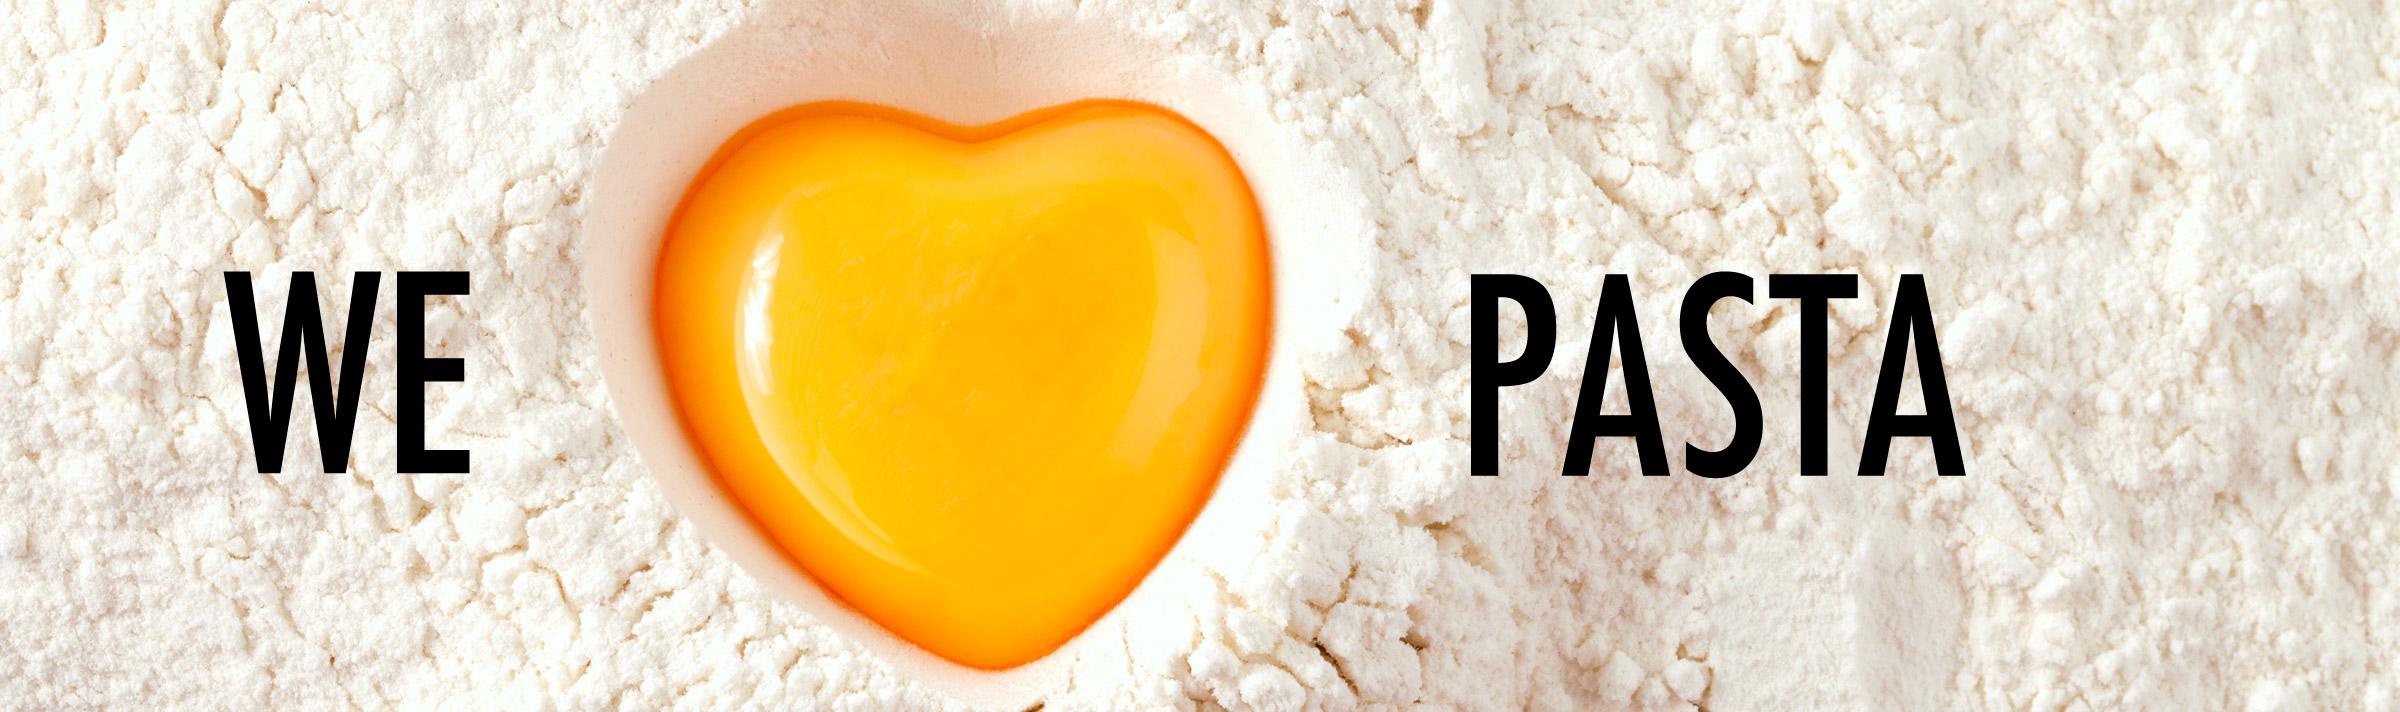 goutness-we-love-pasta-ok